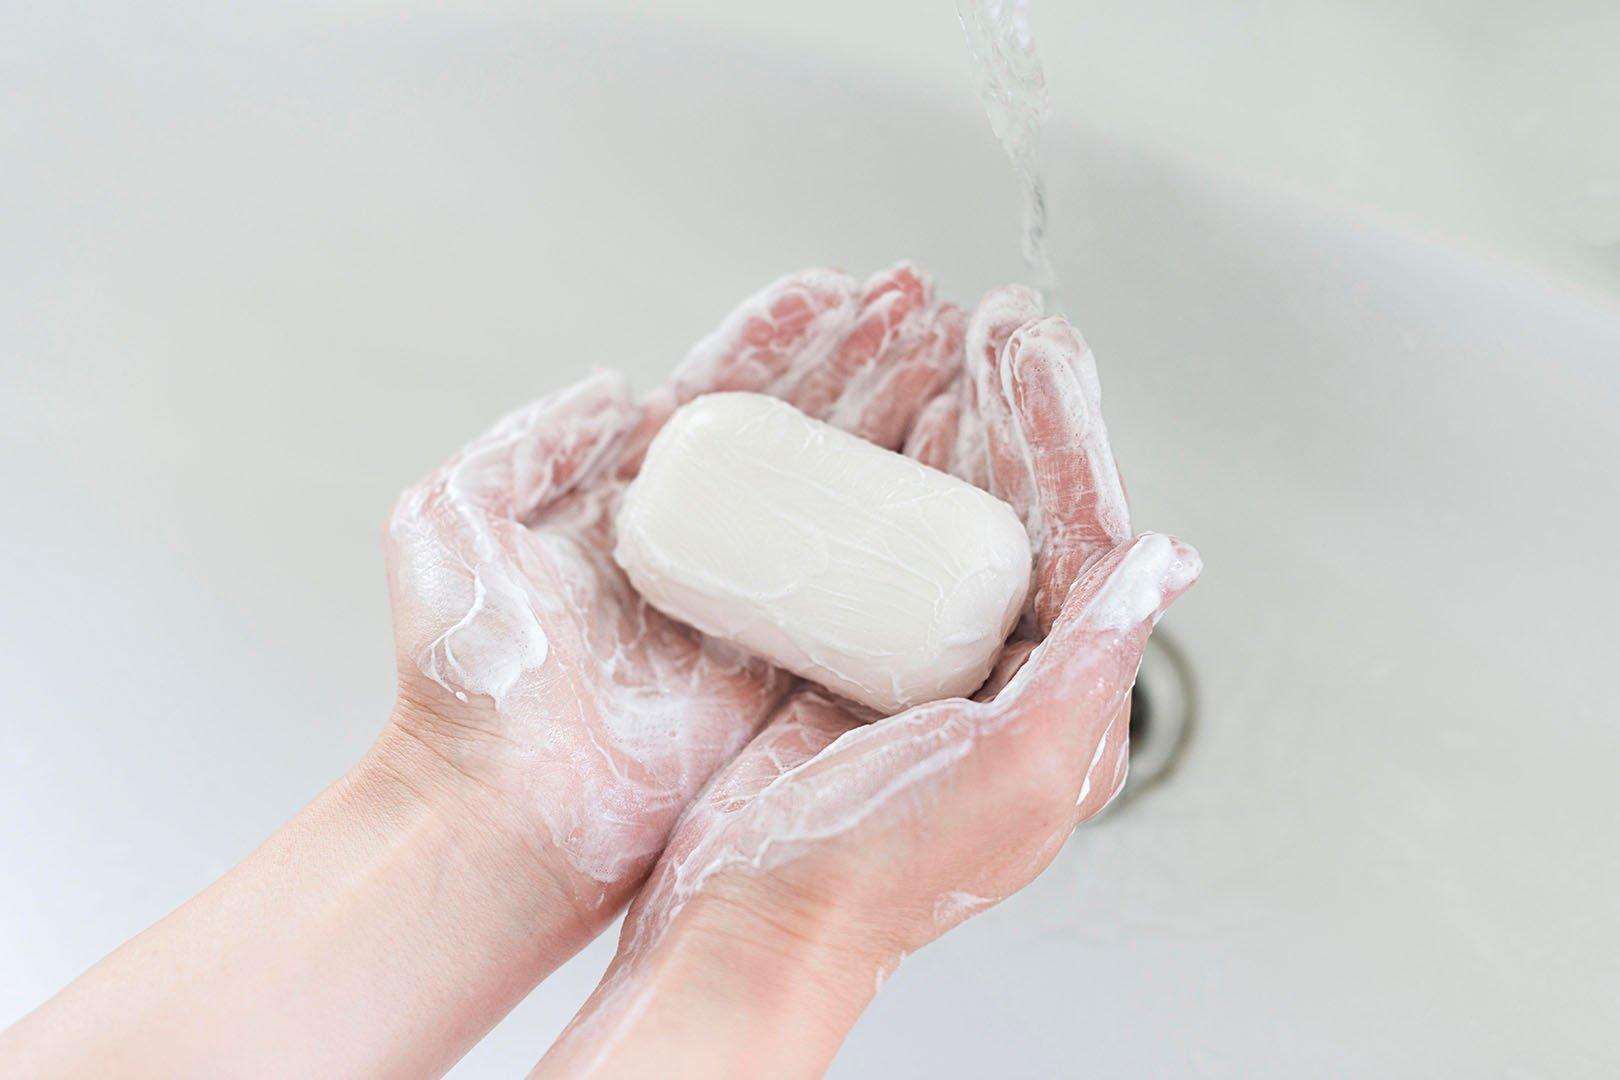 Sabun Antibakteri vs Sabun Biasa, Manakah yang Sebaiknya Digunakan?